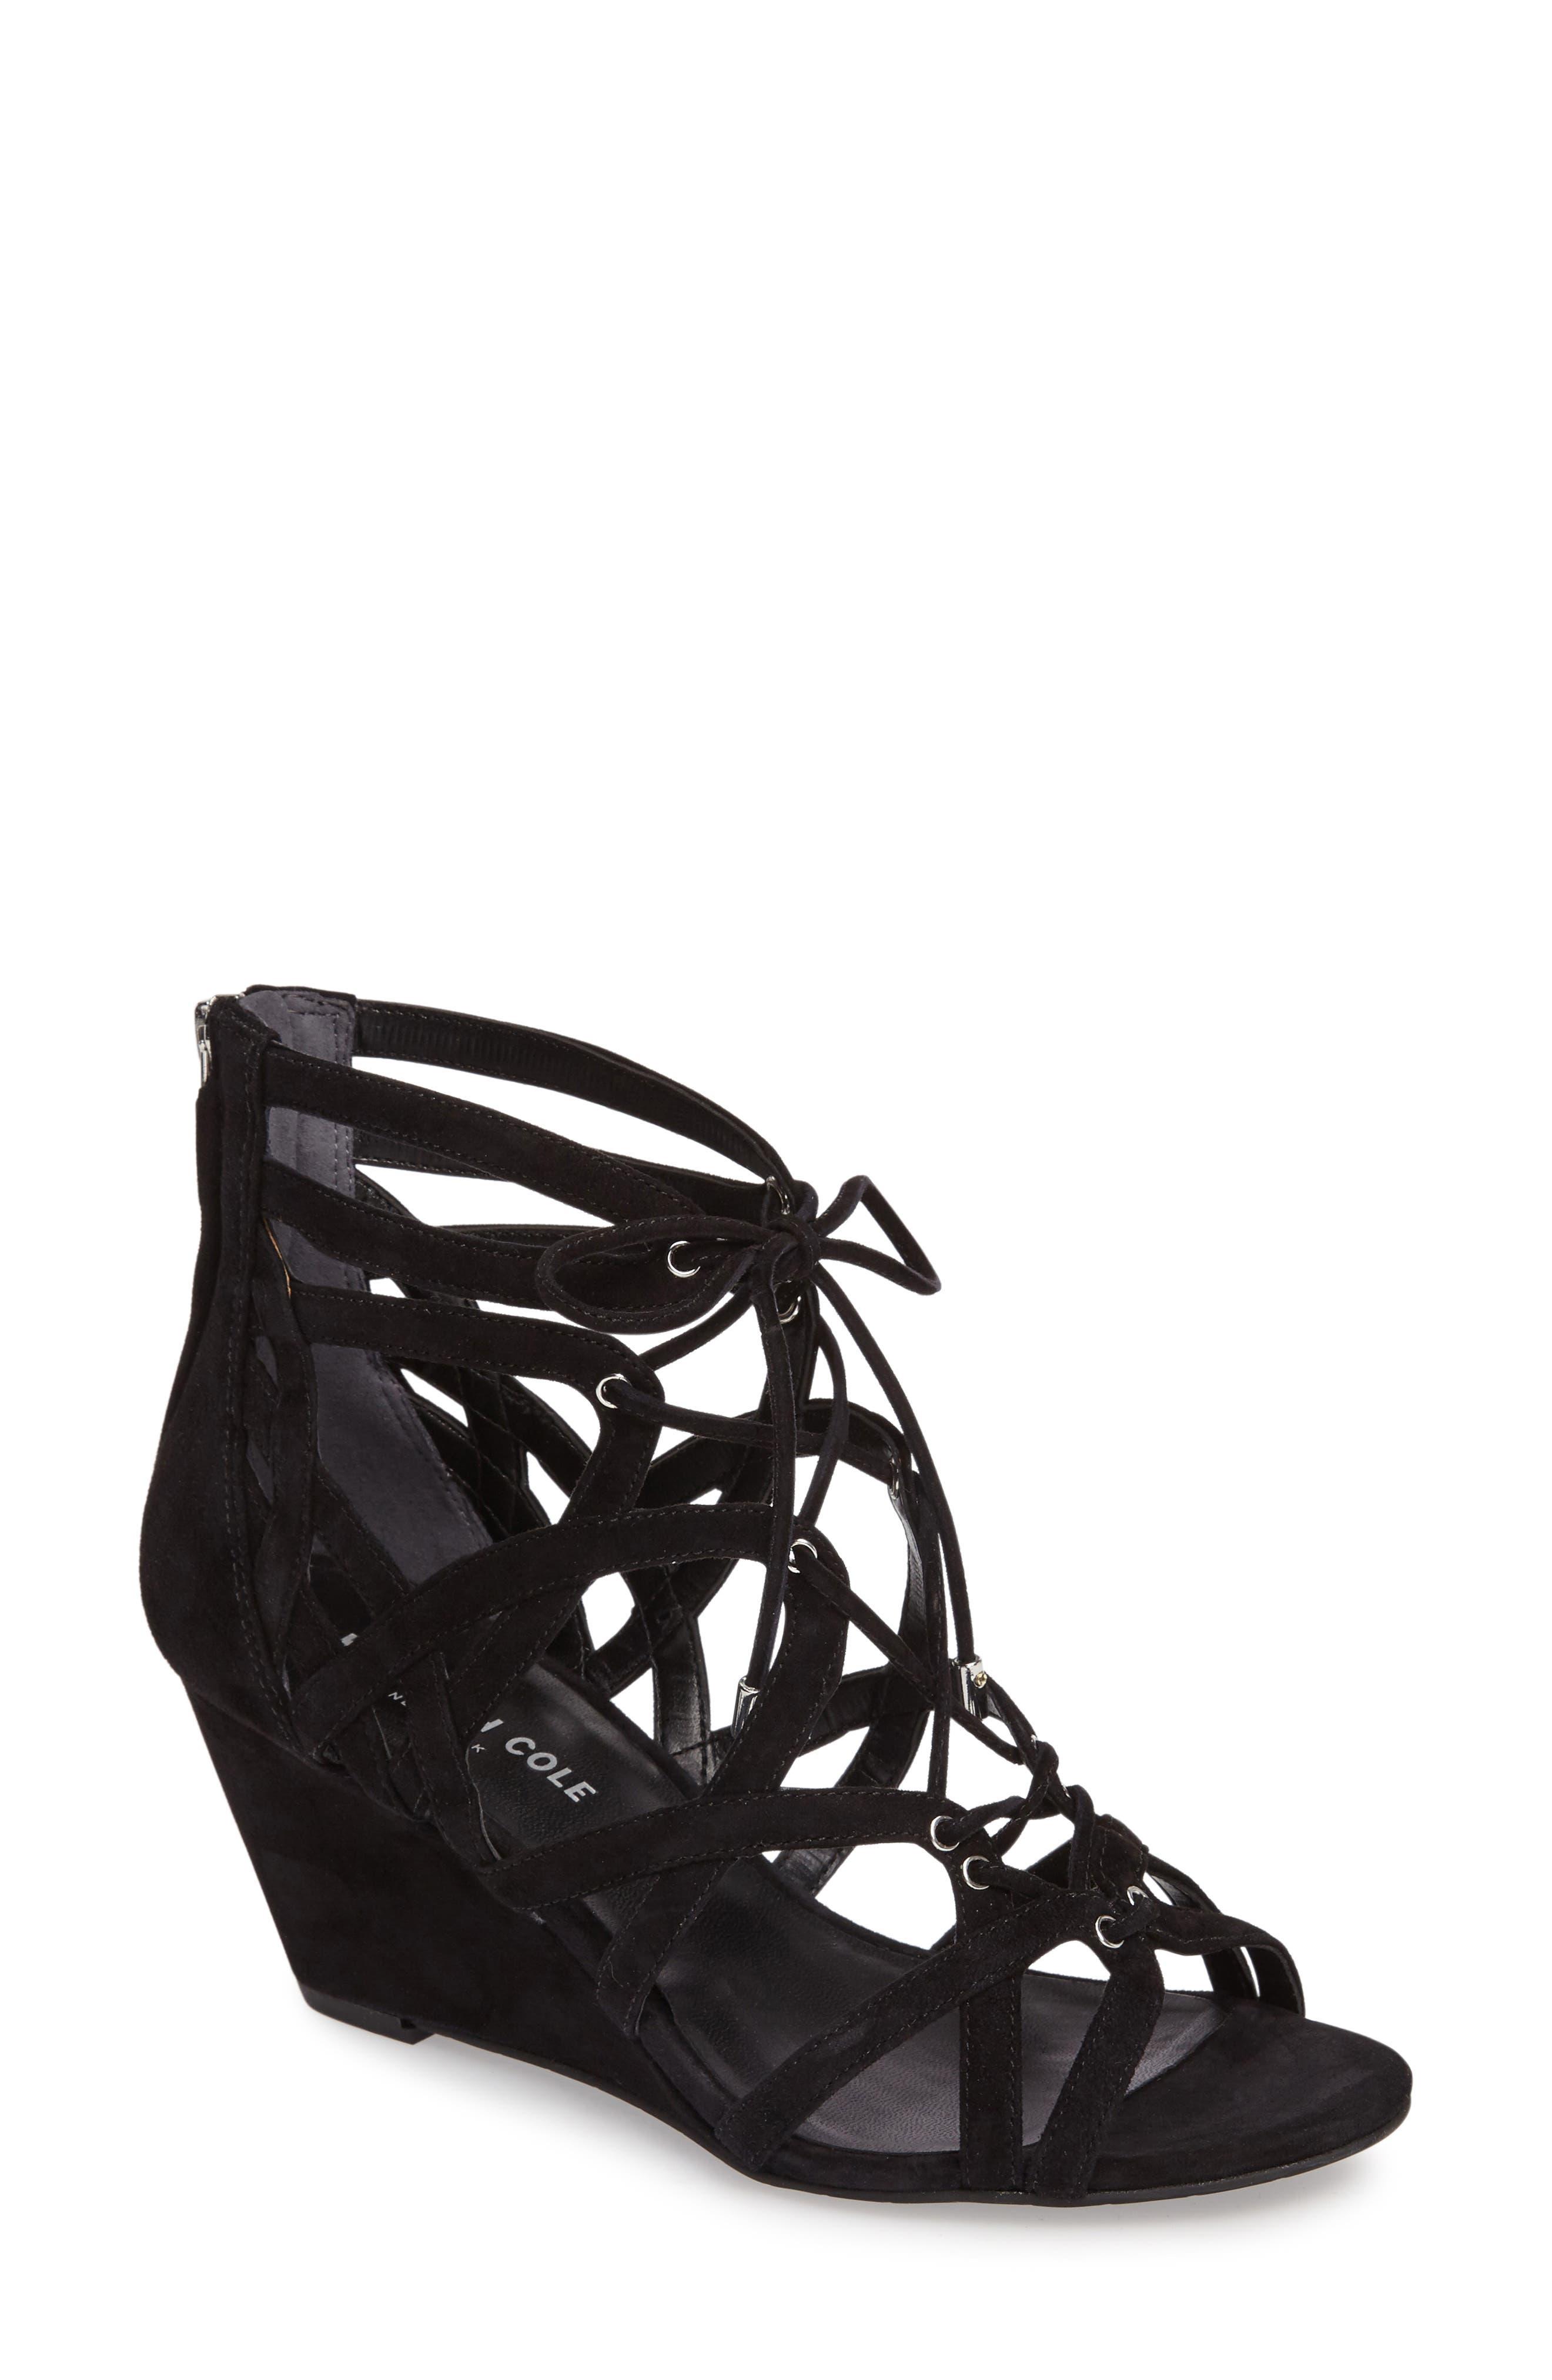 'Dylan' Wedge Sandal,                         Main,                         color, Black Suede